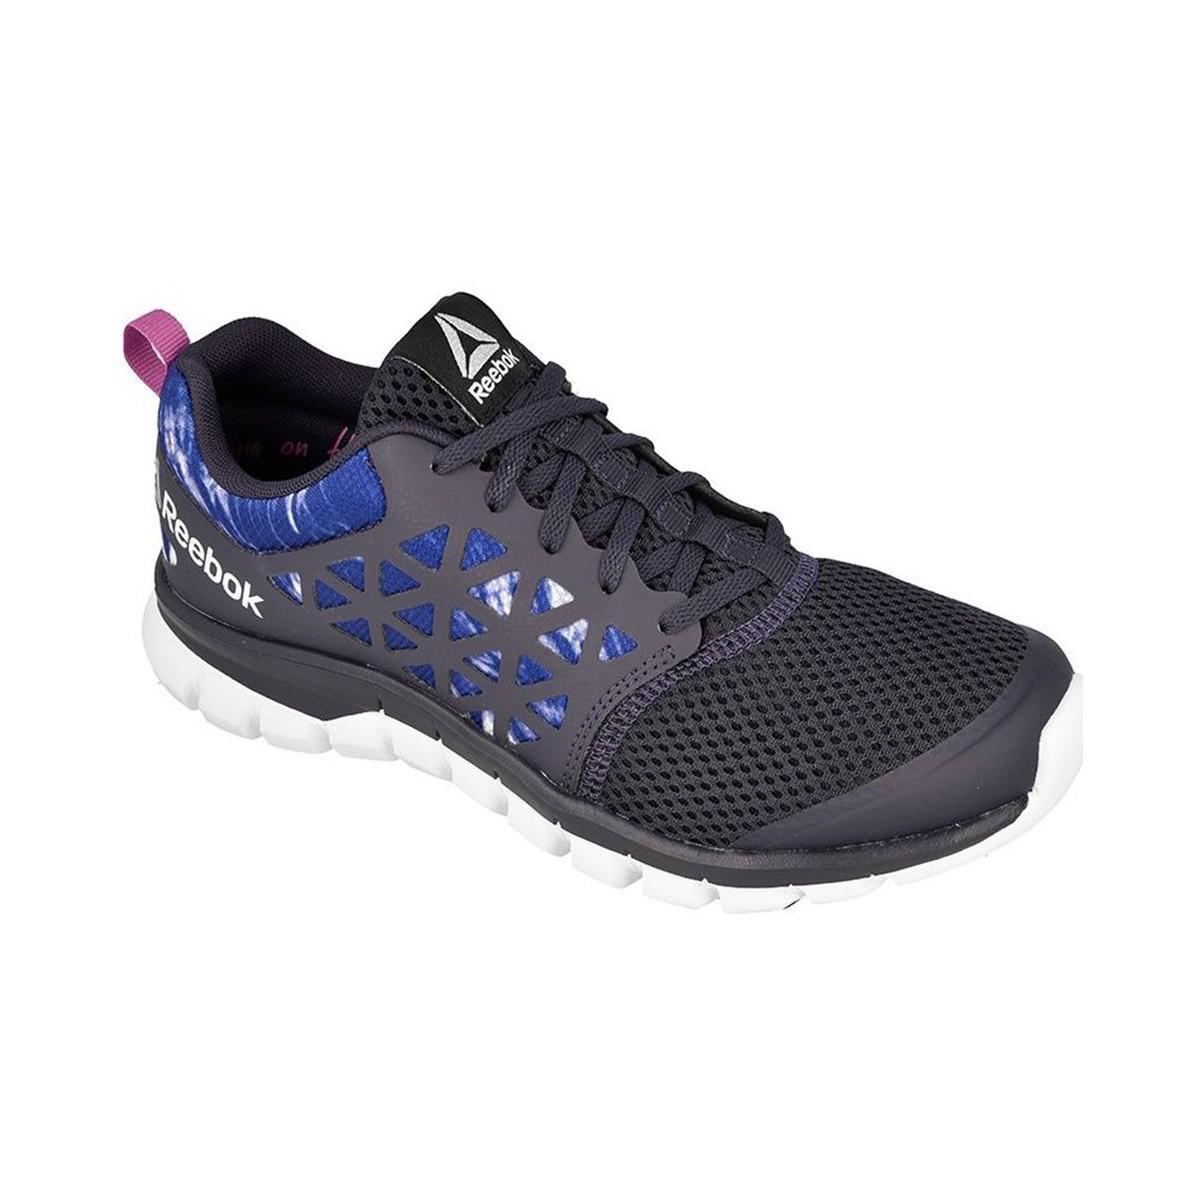 8ce5b1605e48 Reebok - Sublite Xt Cushion 20 Mt W Women s Shoes (trainers) In Purple -.  View fullscreen